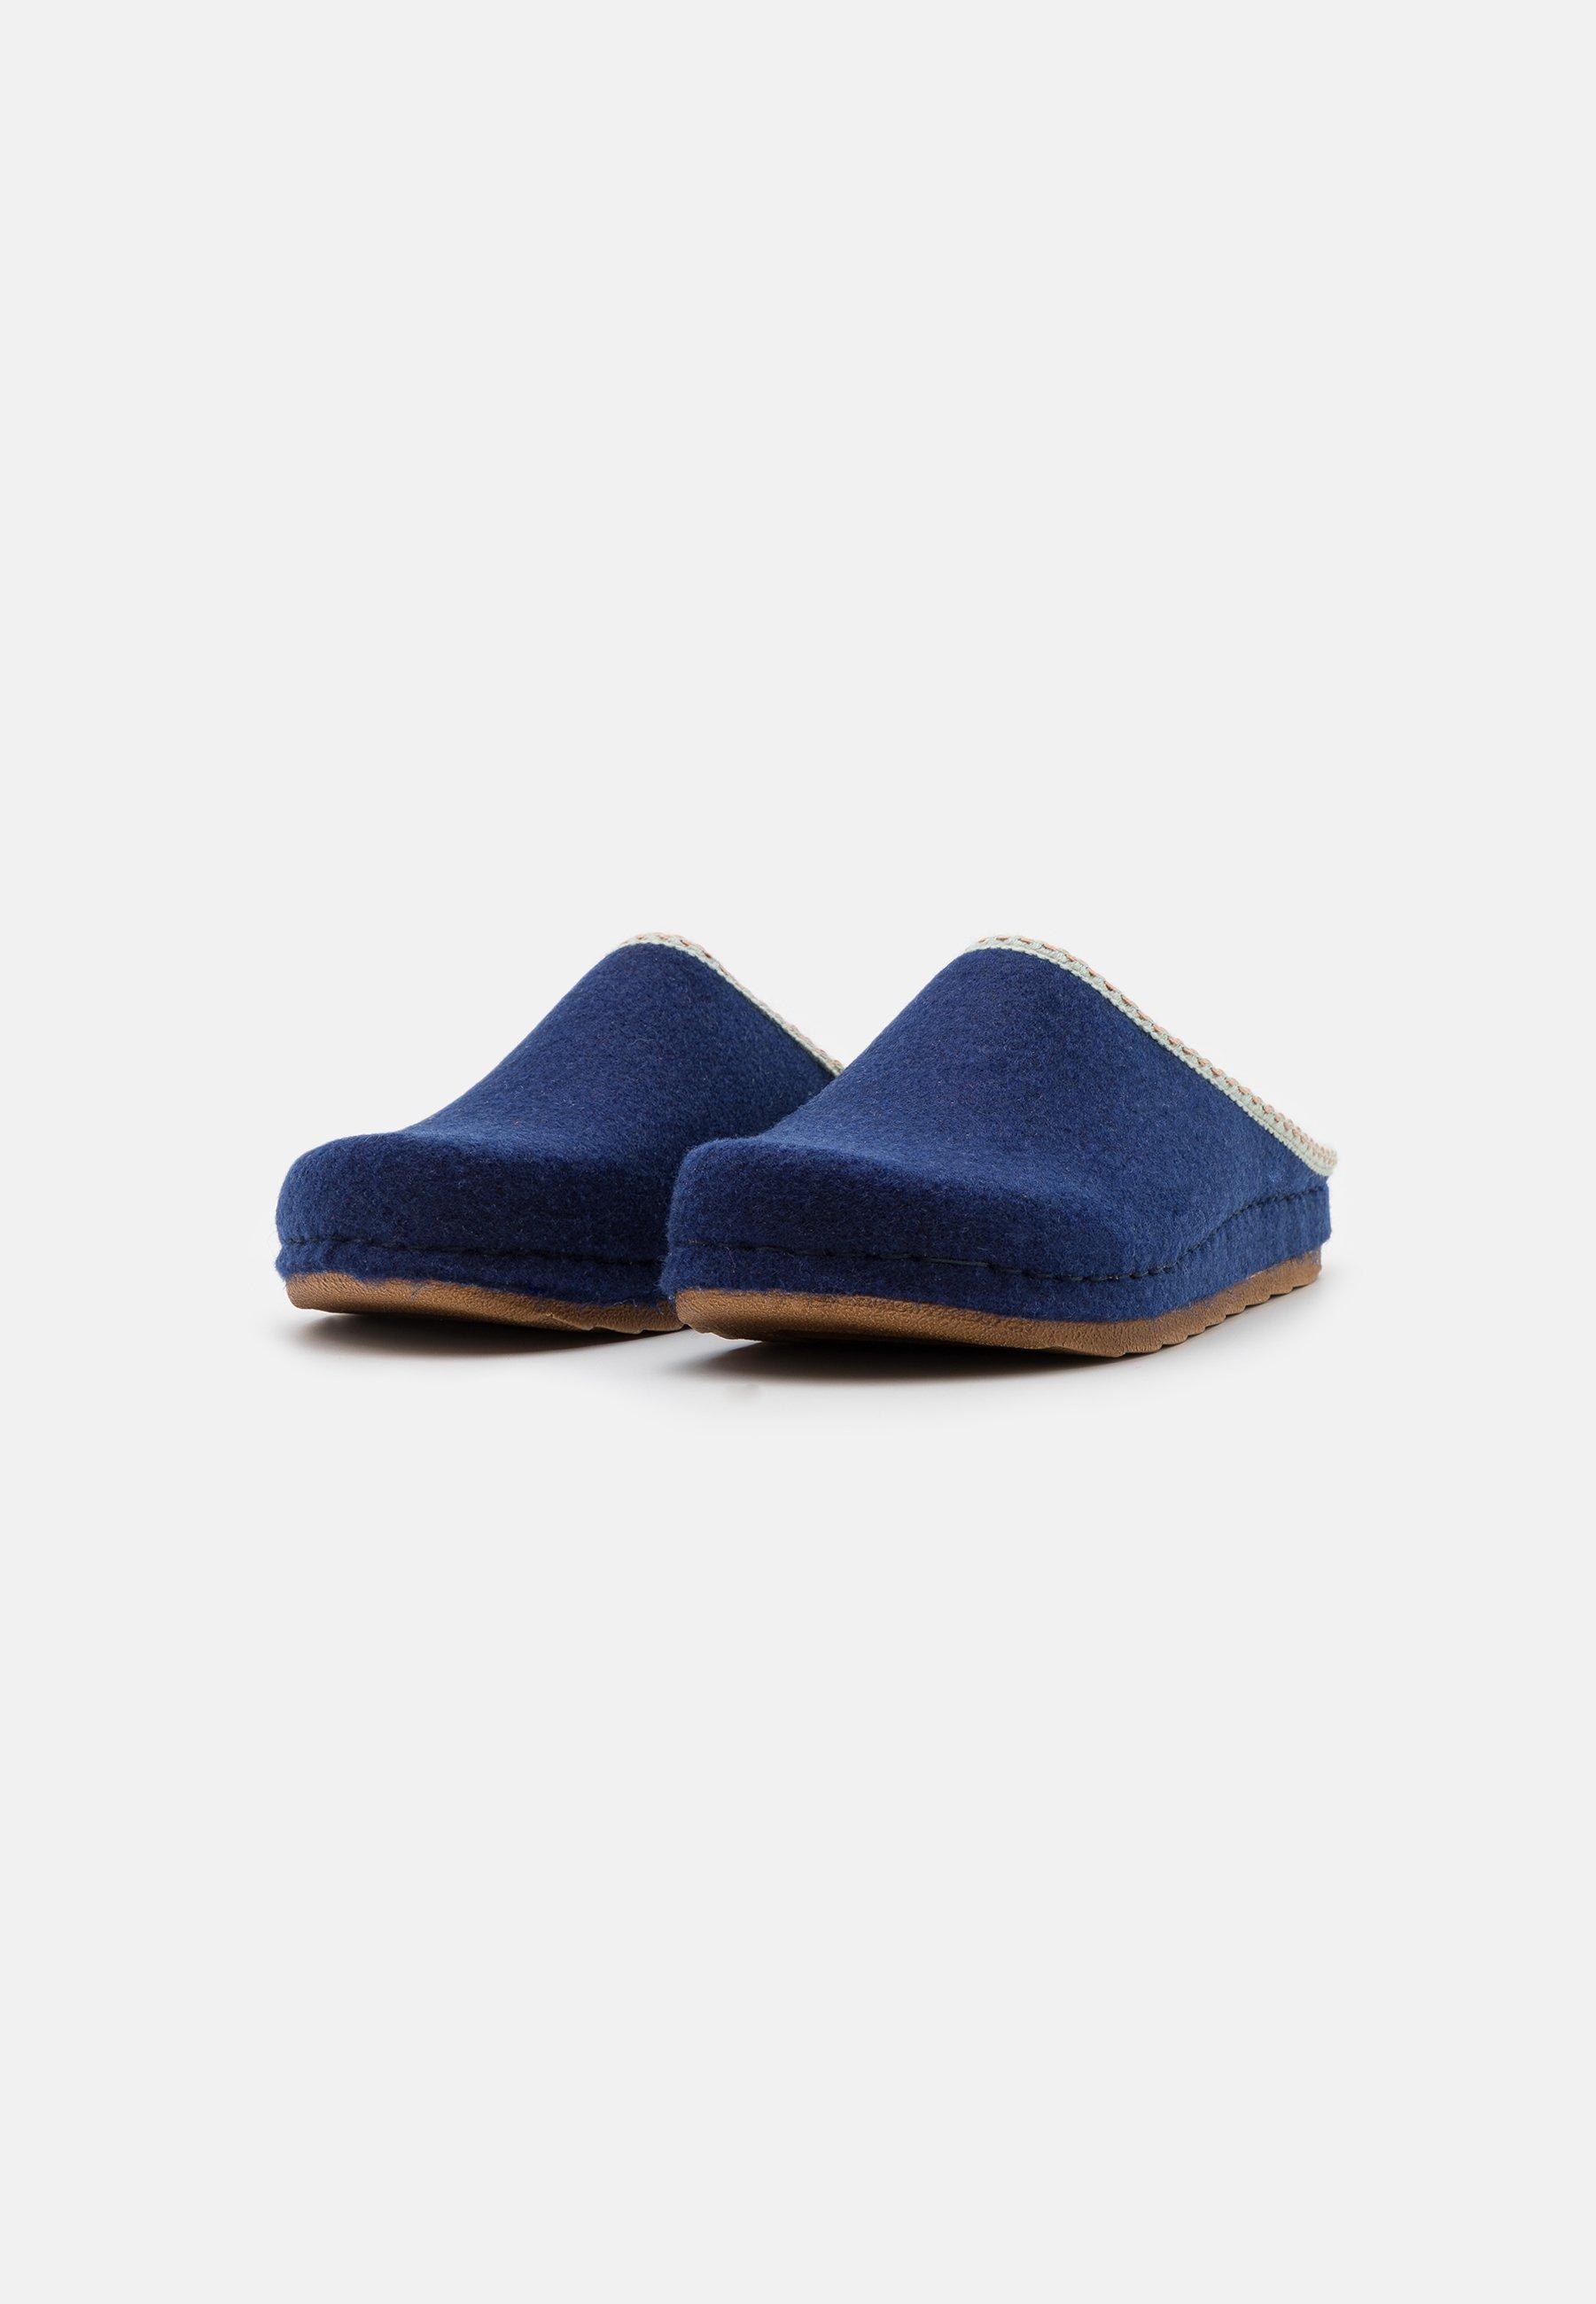 s.Oliver Hausschuh blue/dunkelblau